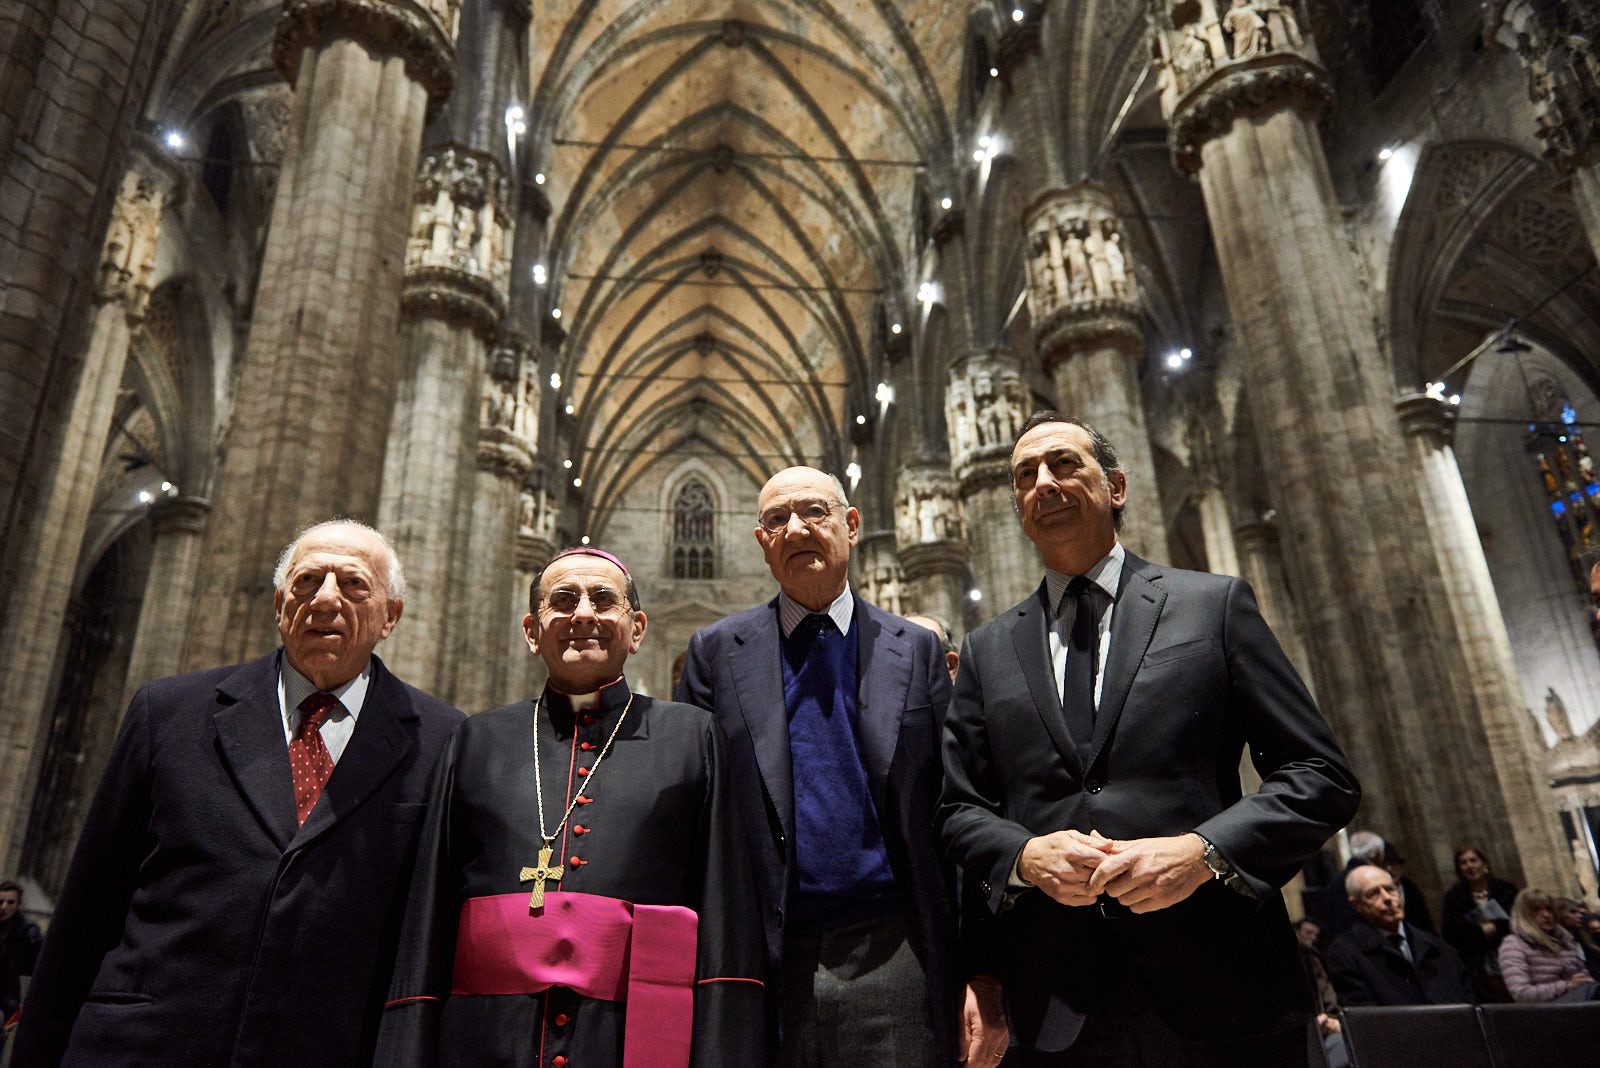 Fedele Confalonieri, Mons. Mario Delpini, Gabriele Nissim e Giuseppe Sala